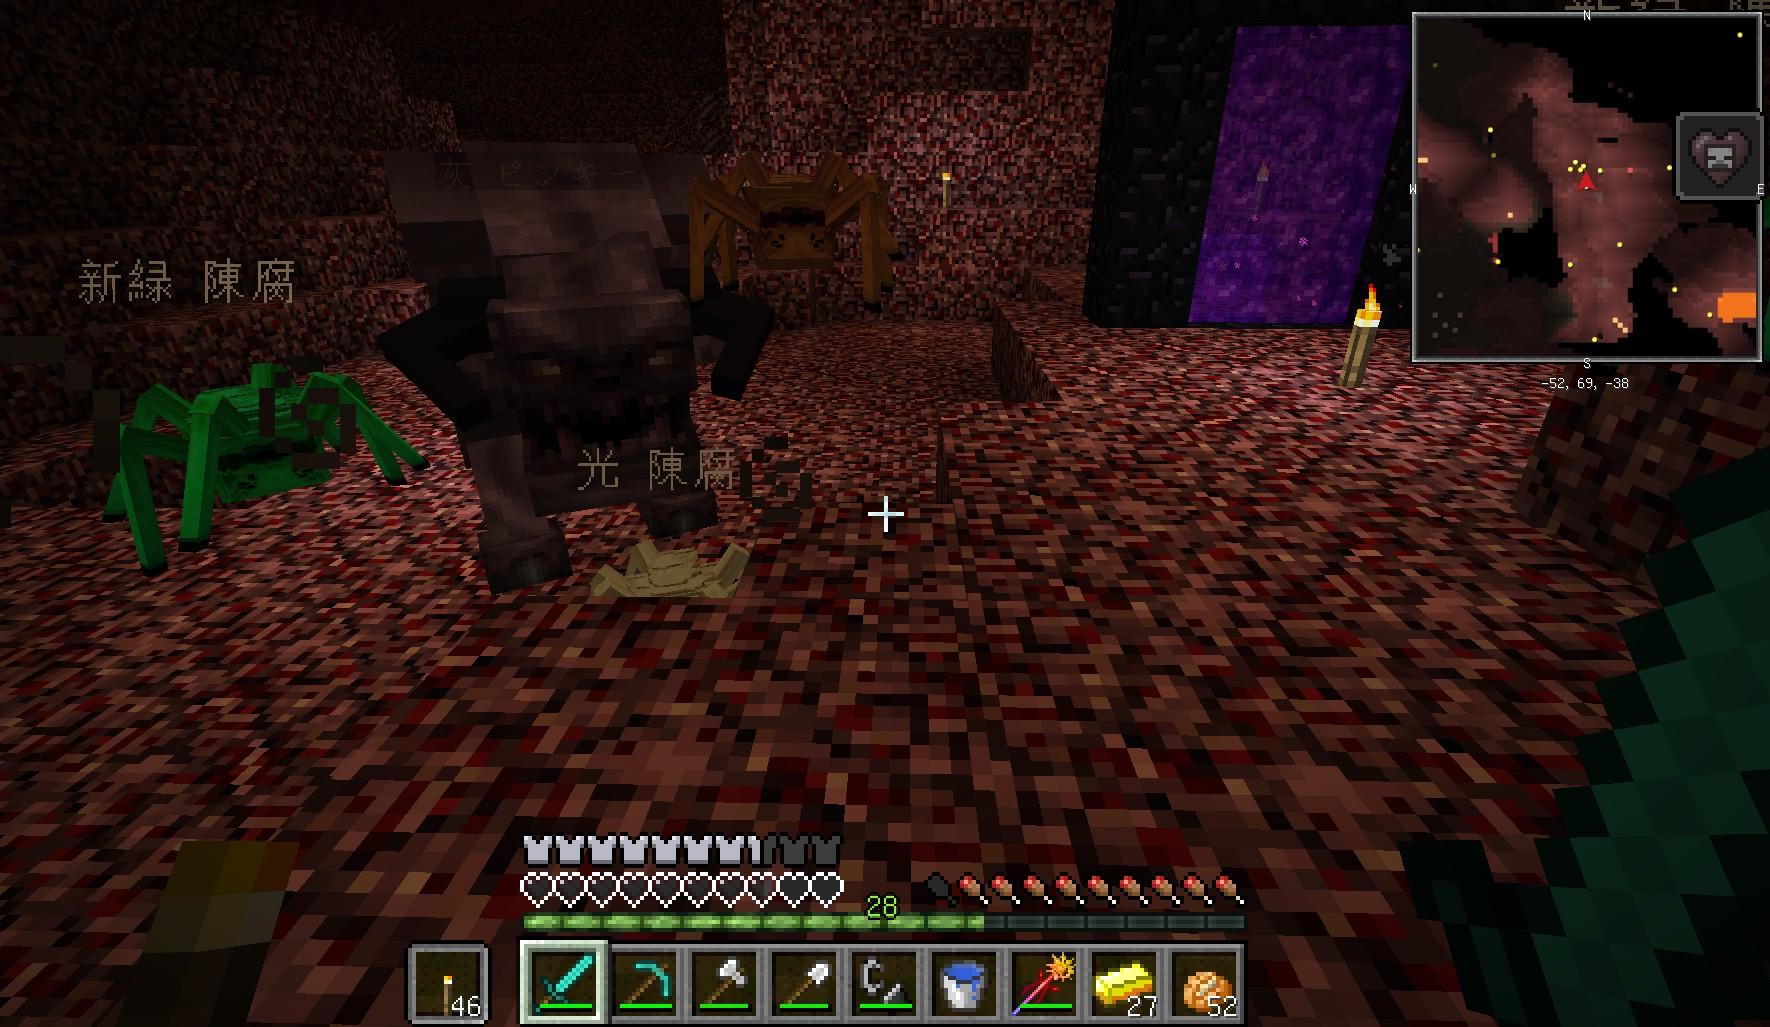 minecraft_056.jpg